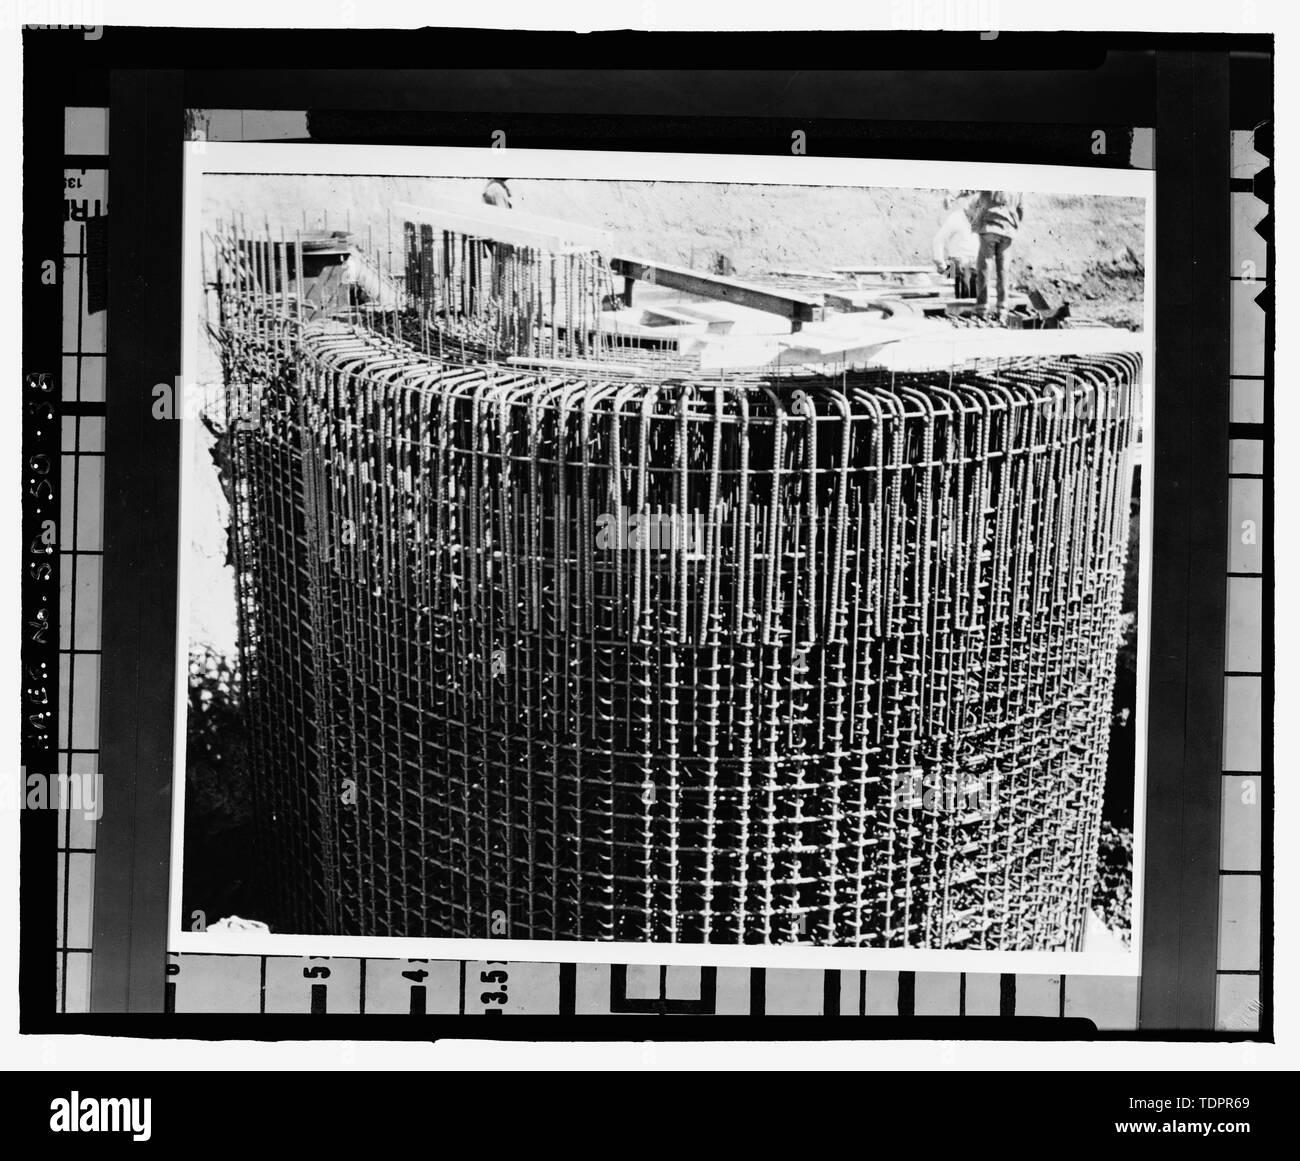 Kiewit Stock Photos & Kiewit Stock Images - Alamy